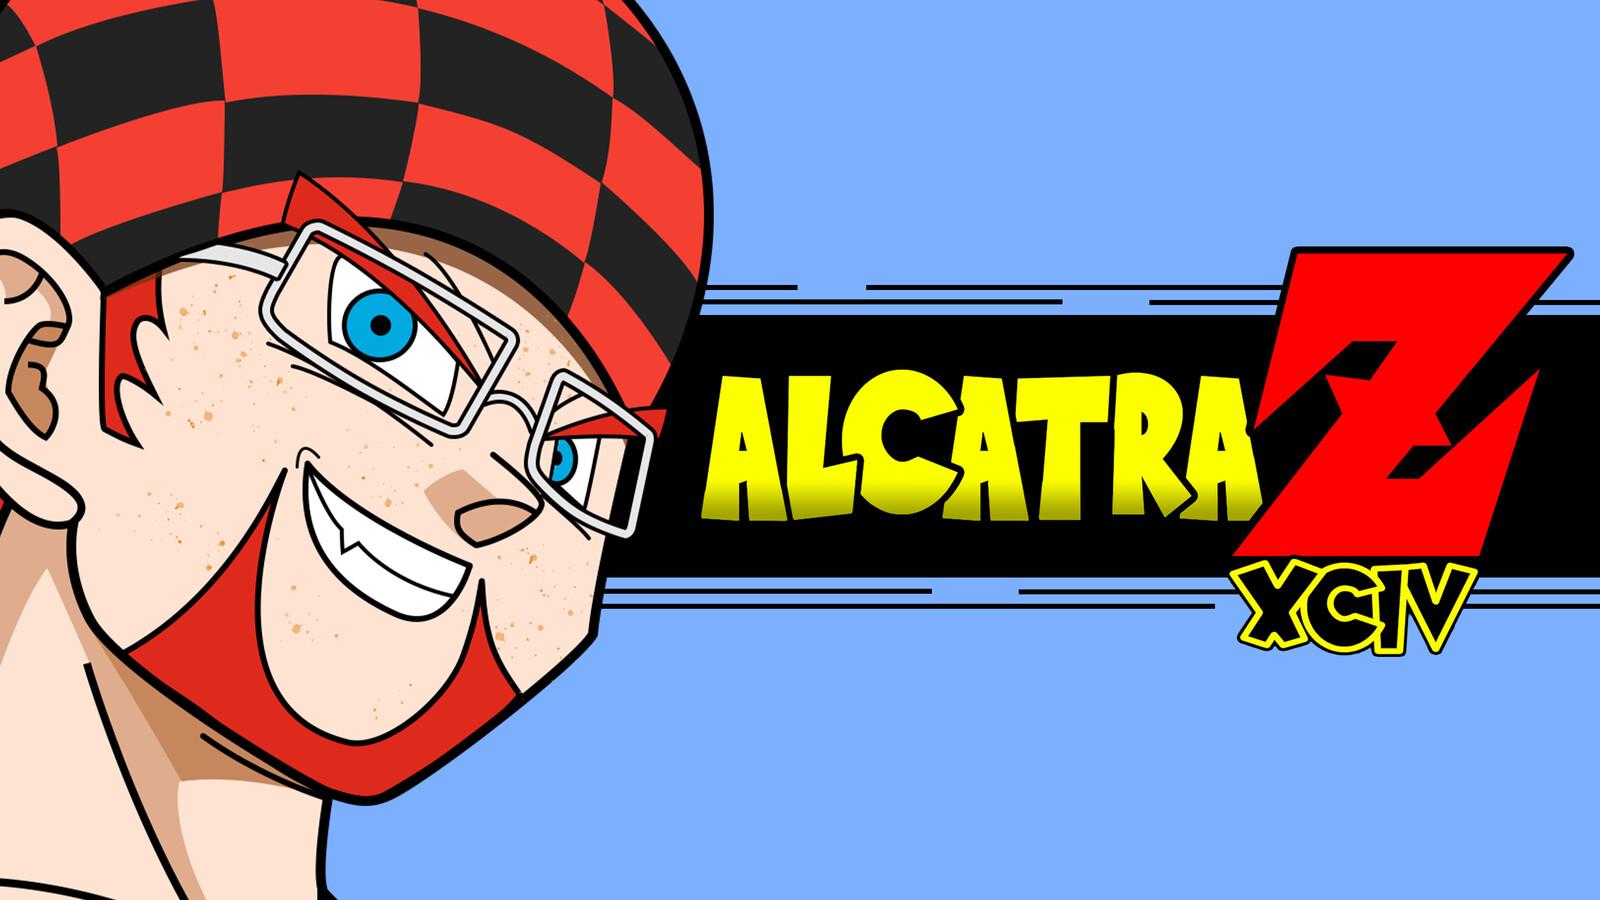 The YouTube banner for AlcatrazXCIV